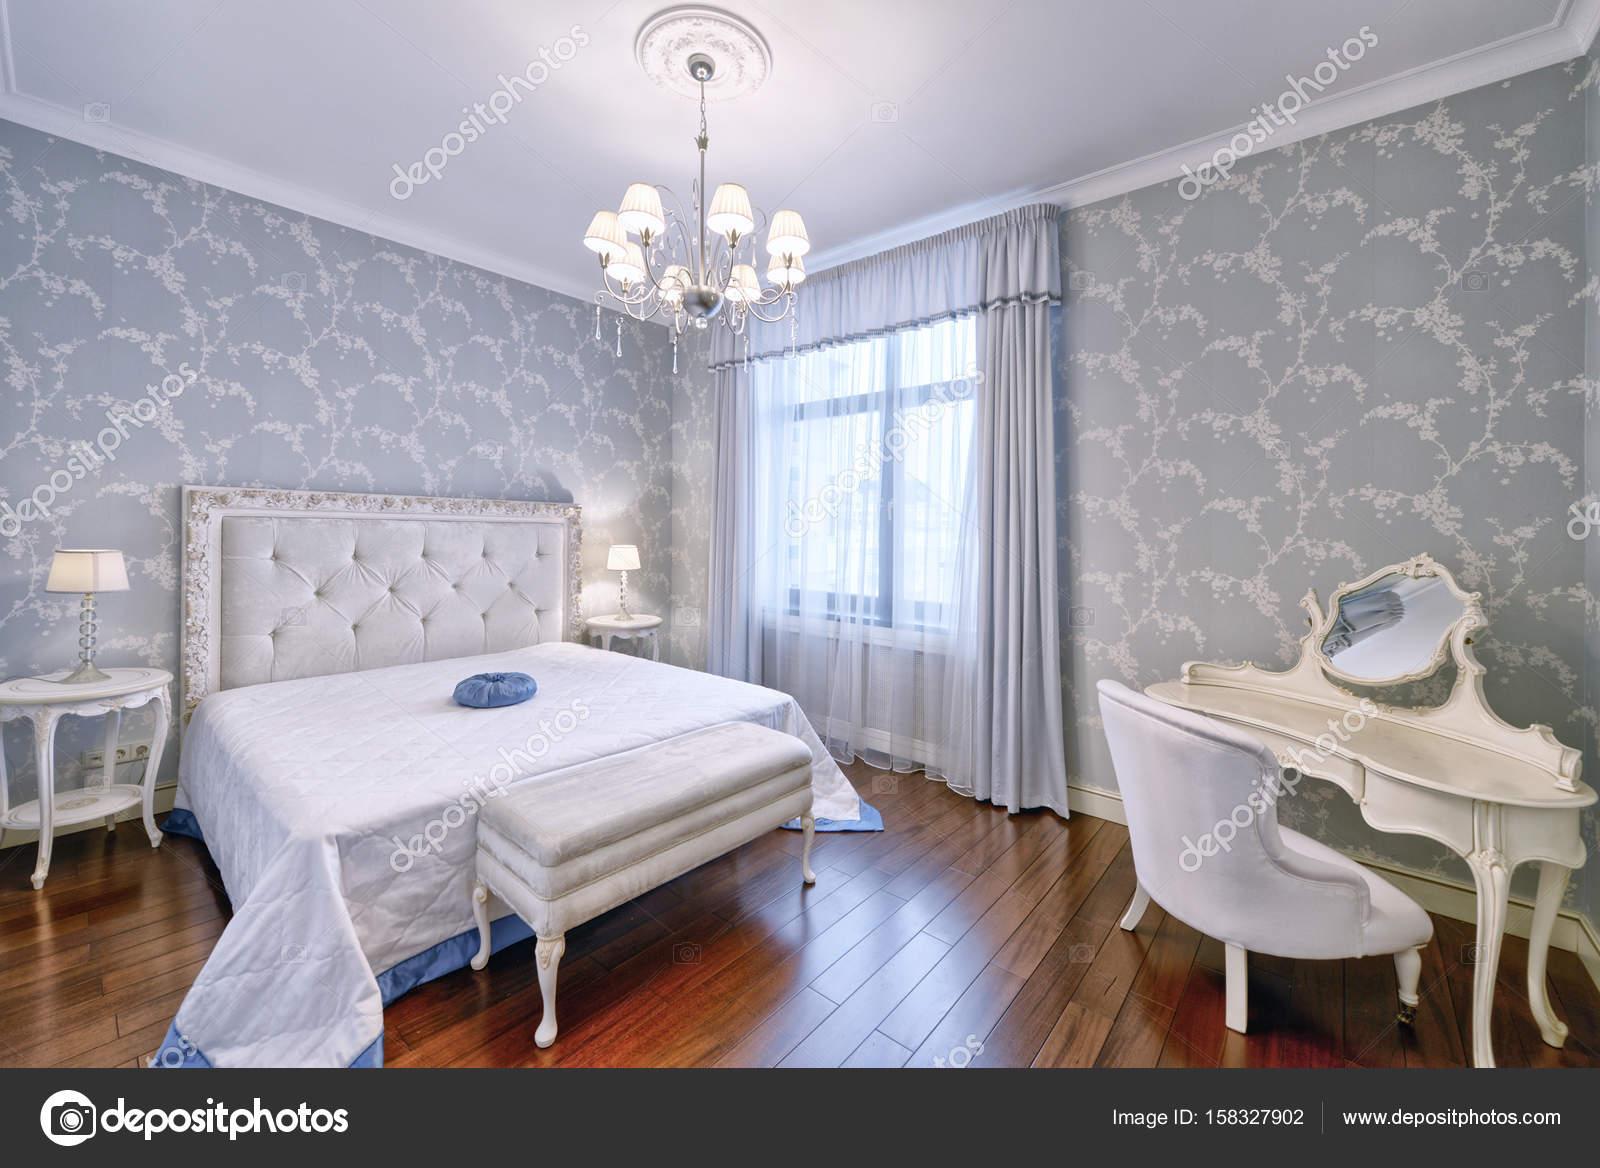 interieur-slaapkamers — Stockfoto © ovchinnikovfoto #158327902